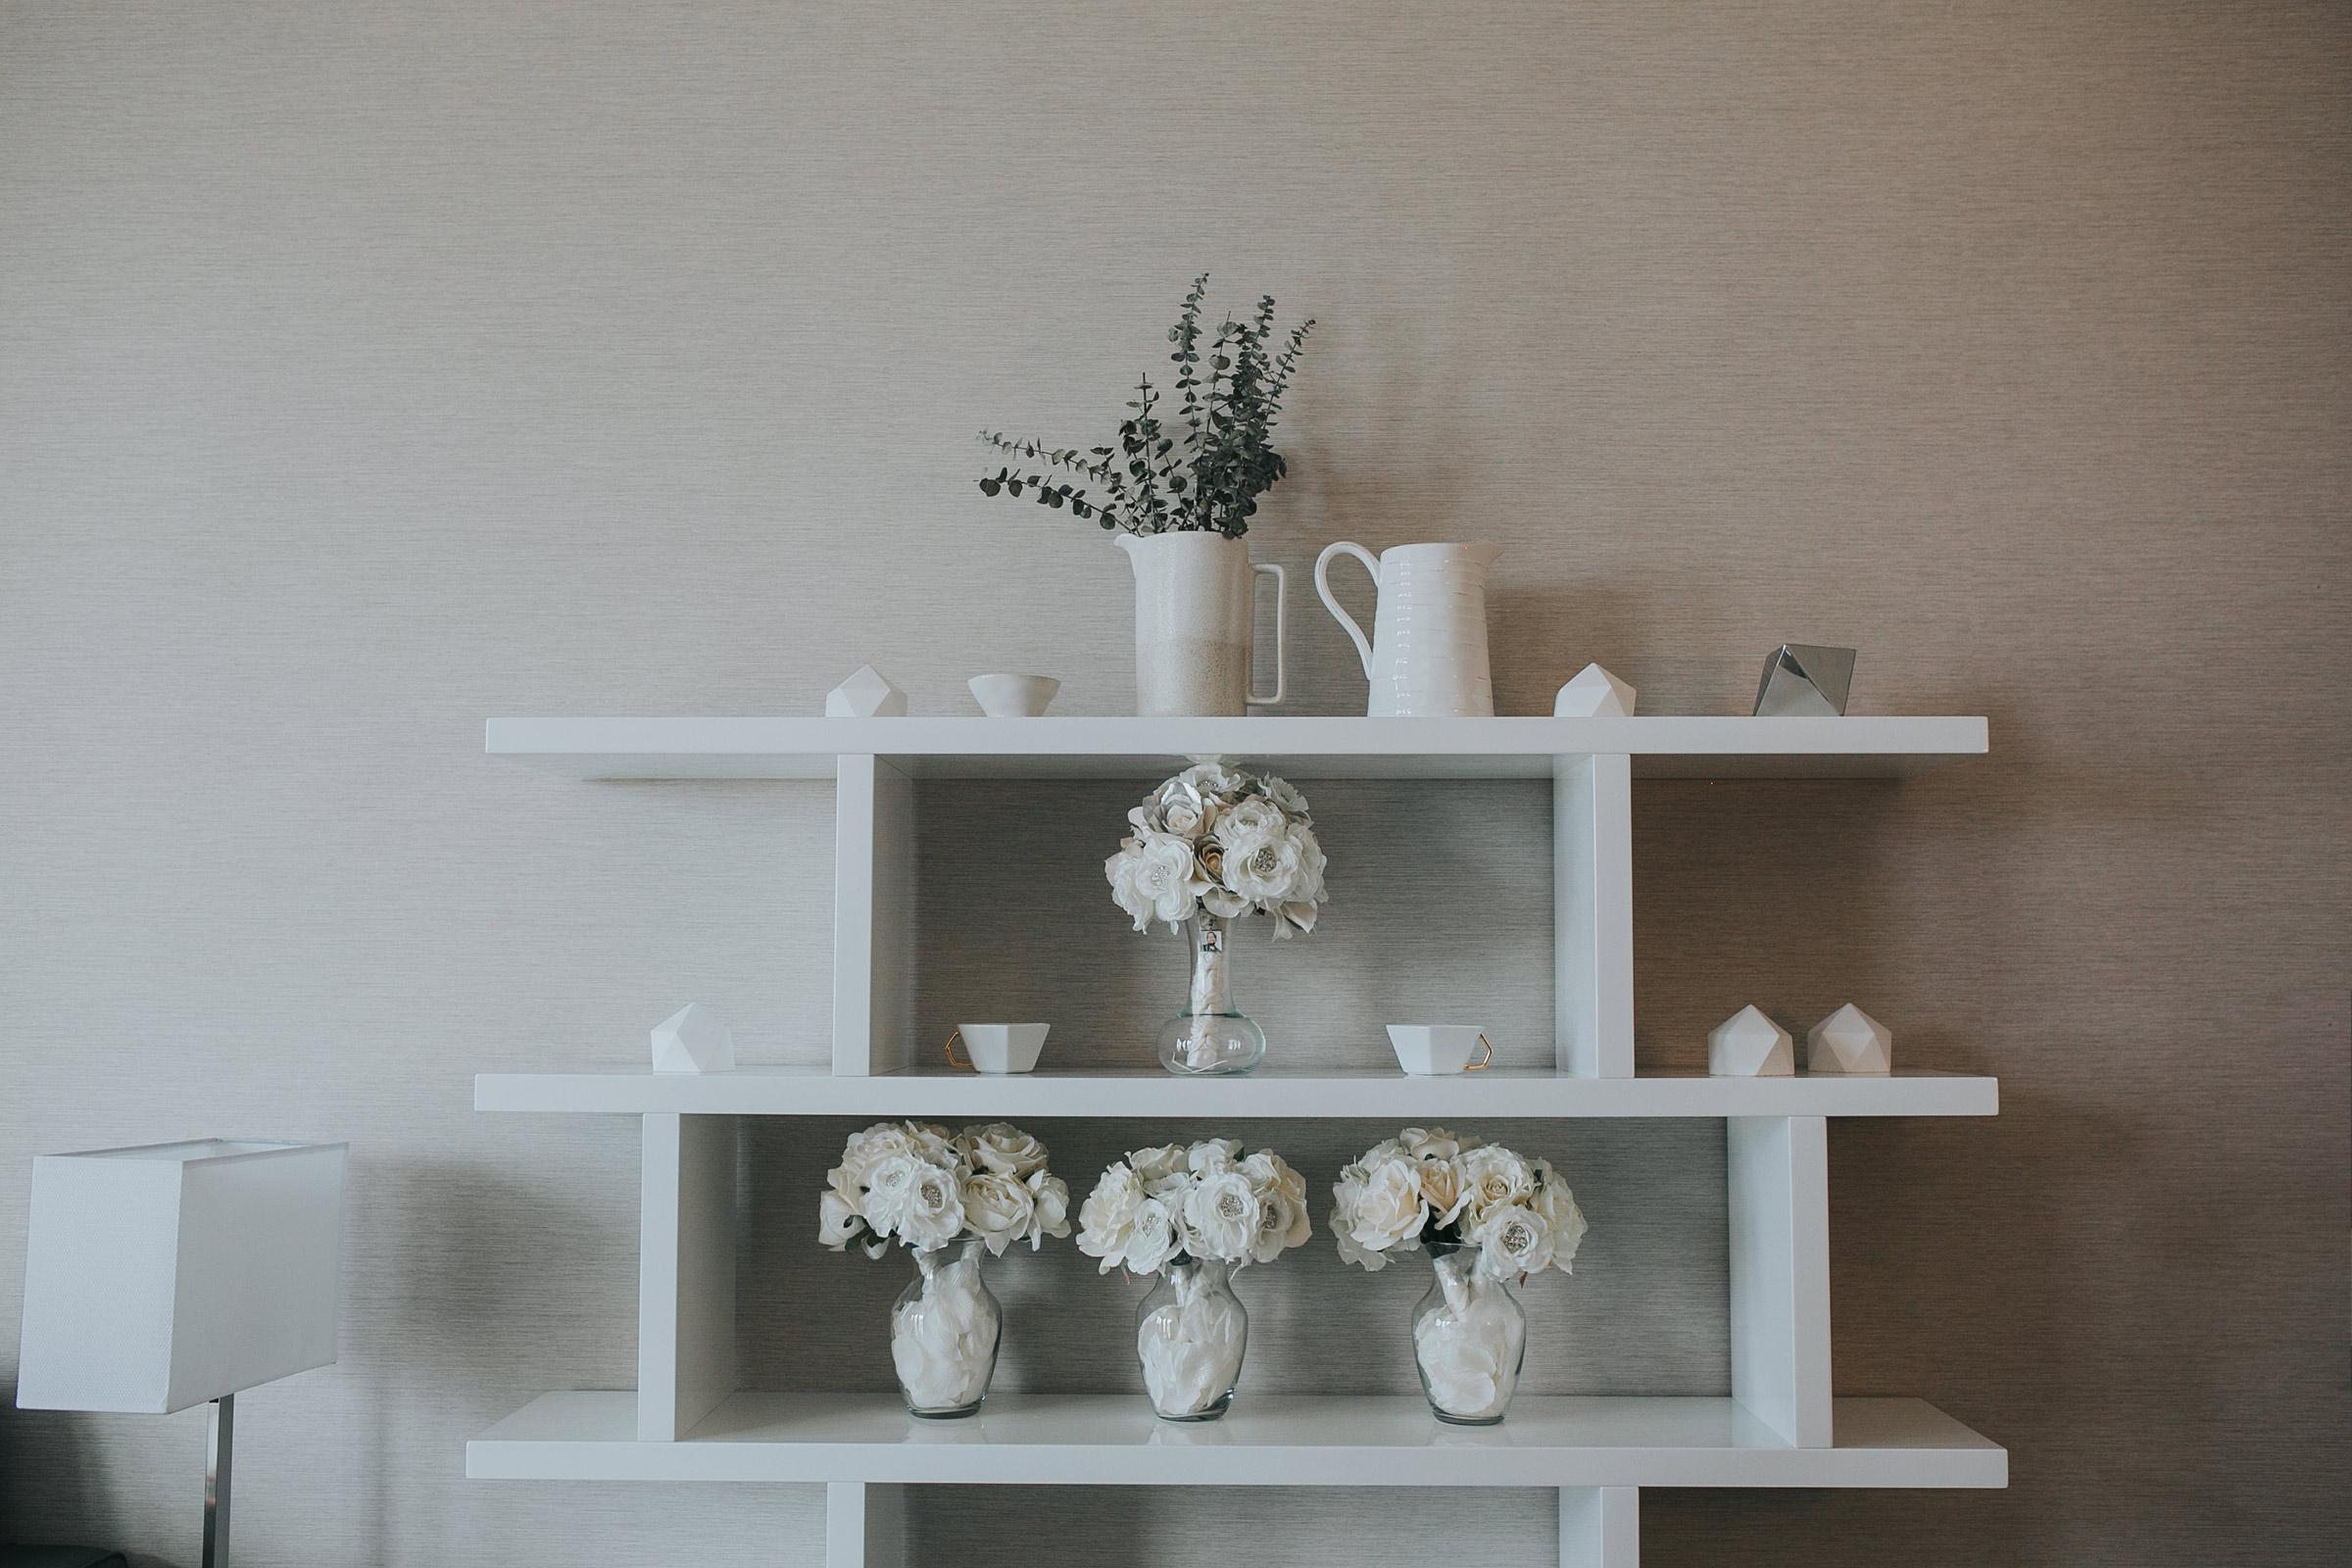 detail-shot-of-bouquets-on-shelf-desmoines-iowa-ac-hotel-raelyn-ramey-photography.jpg